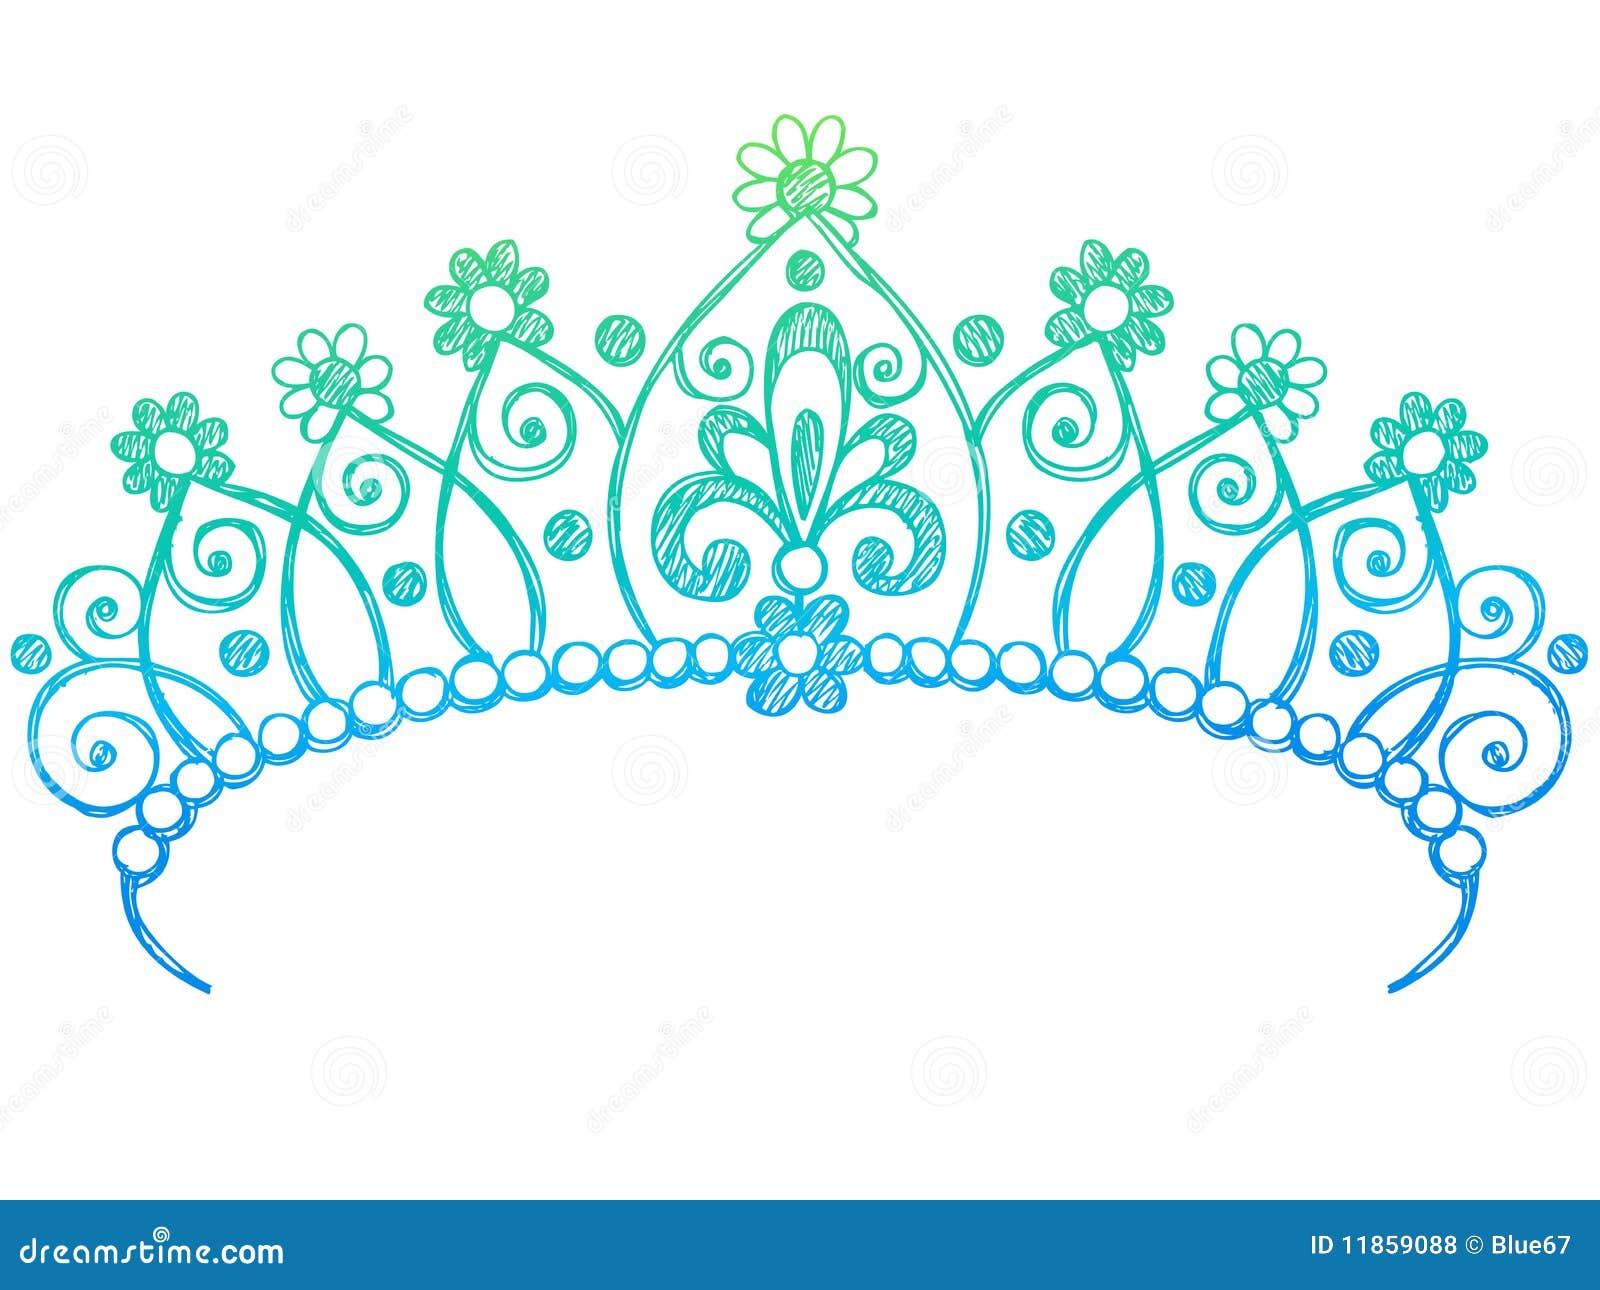 Sketchy Princess Tiara Crown Notebook Doodles Stock Vector